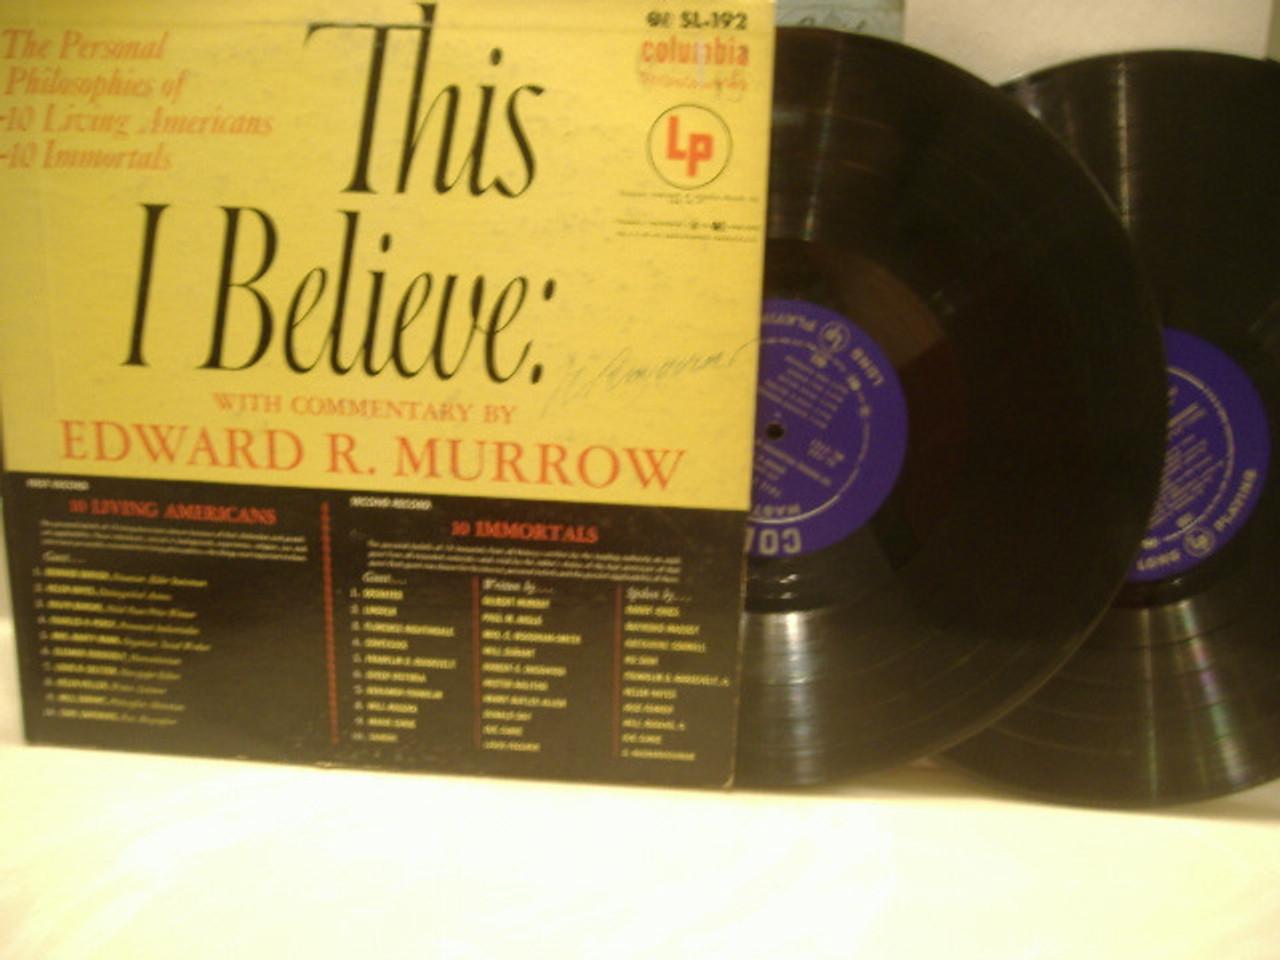 Murrow, Edward R. LP Signed Autograph This I Believe Double LP